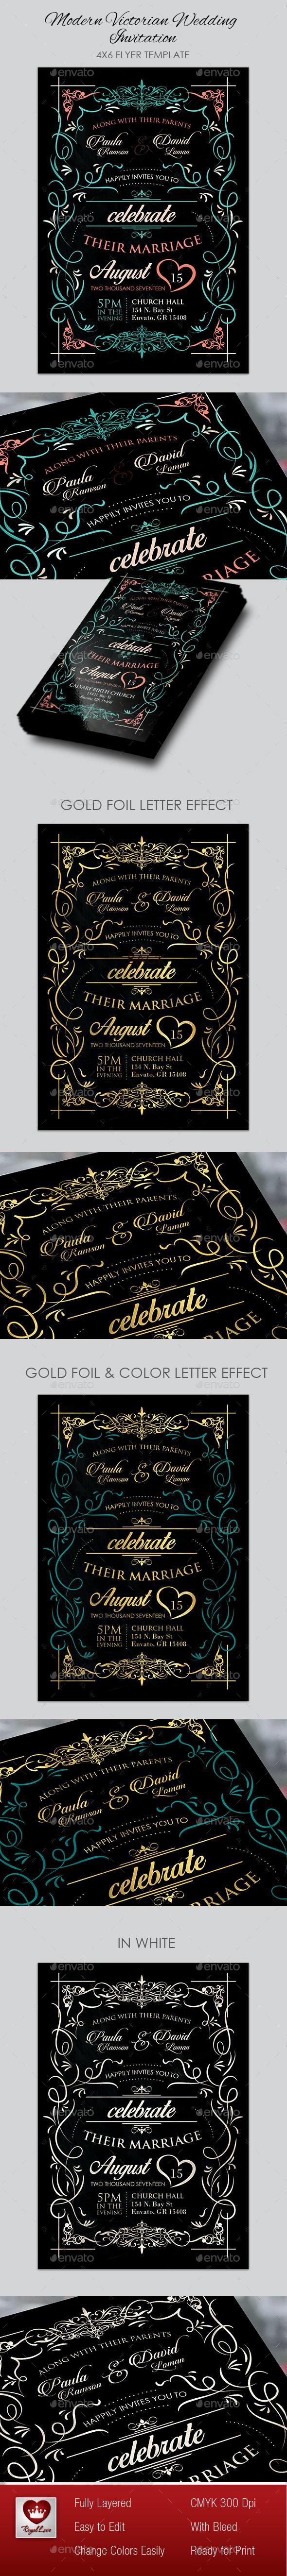 Modern Victorian Wedding Invitation I - Invitations Cards & Invites